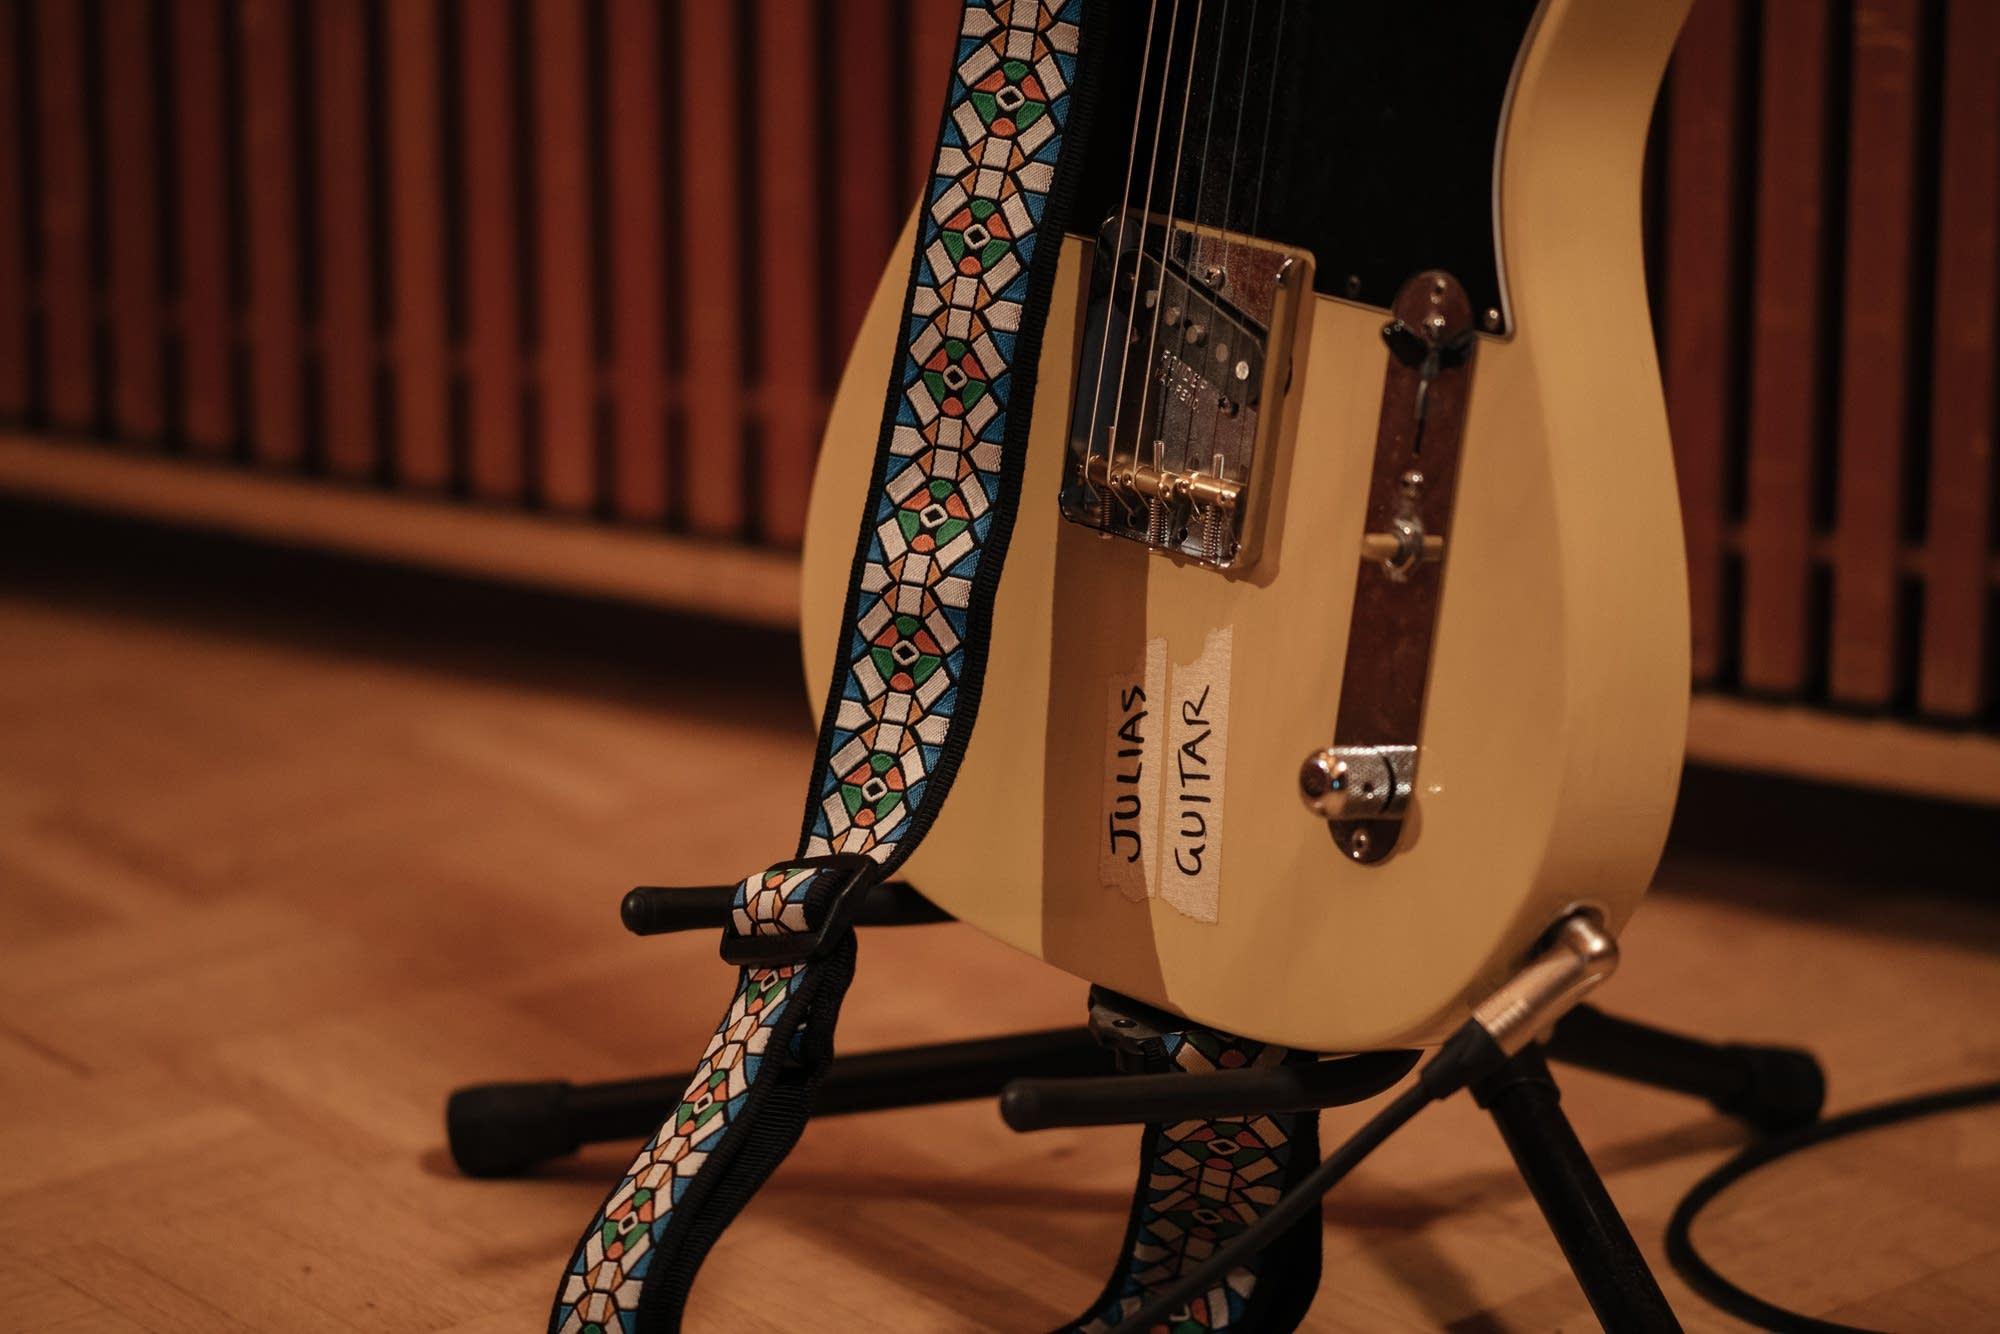 Julia Jacklin performs in The Current studio